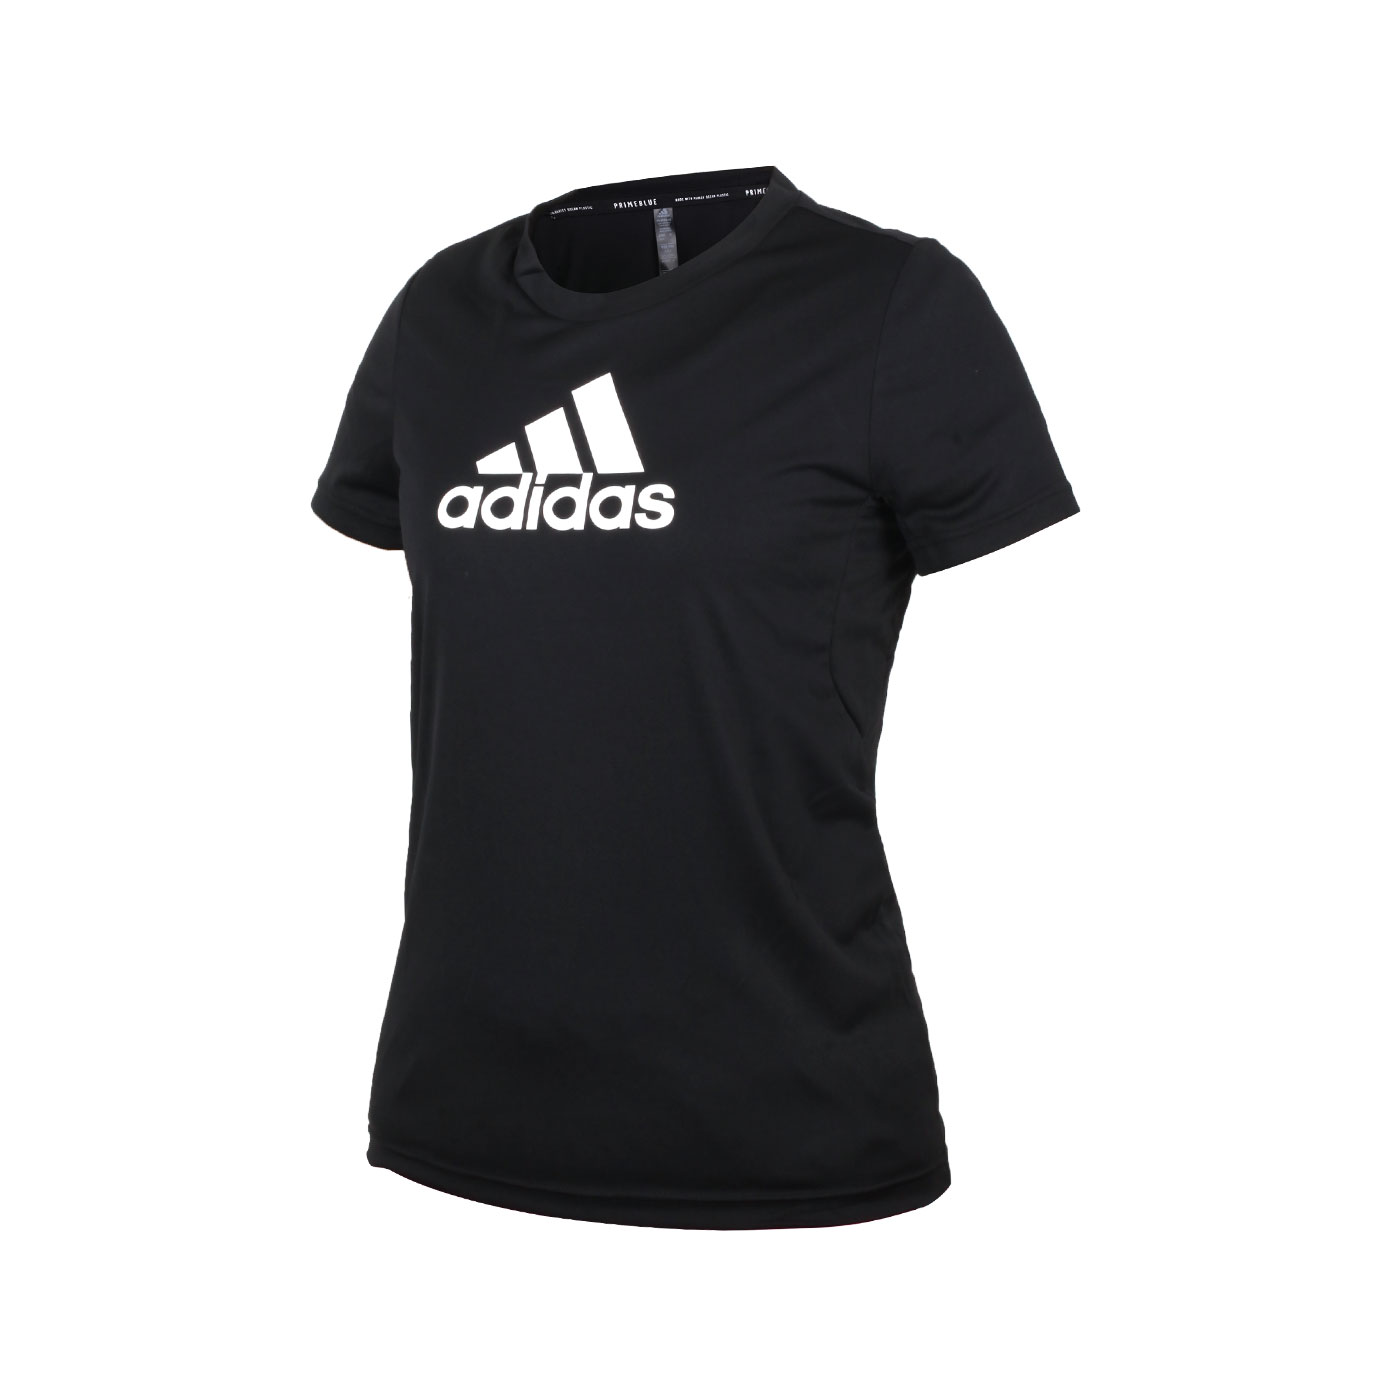 ADIDAS 女款短袖T恤 GL3820